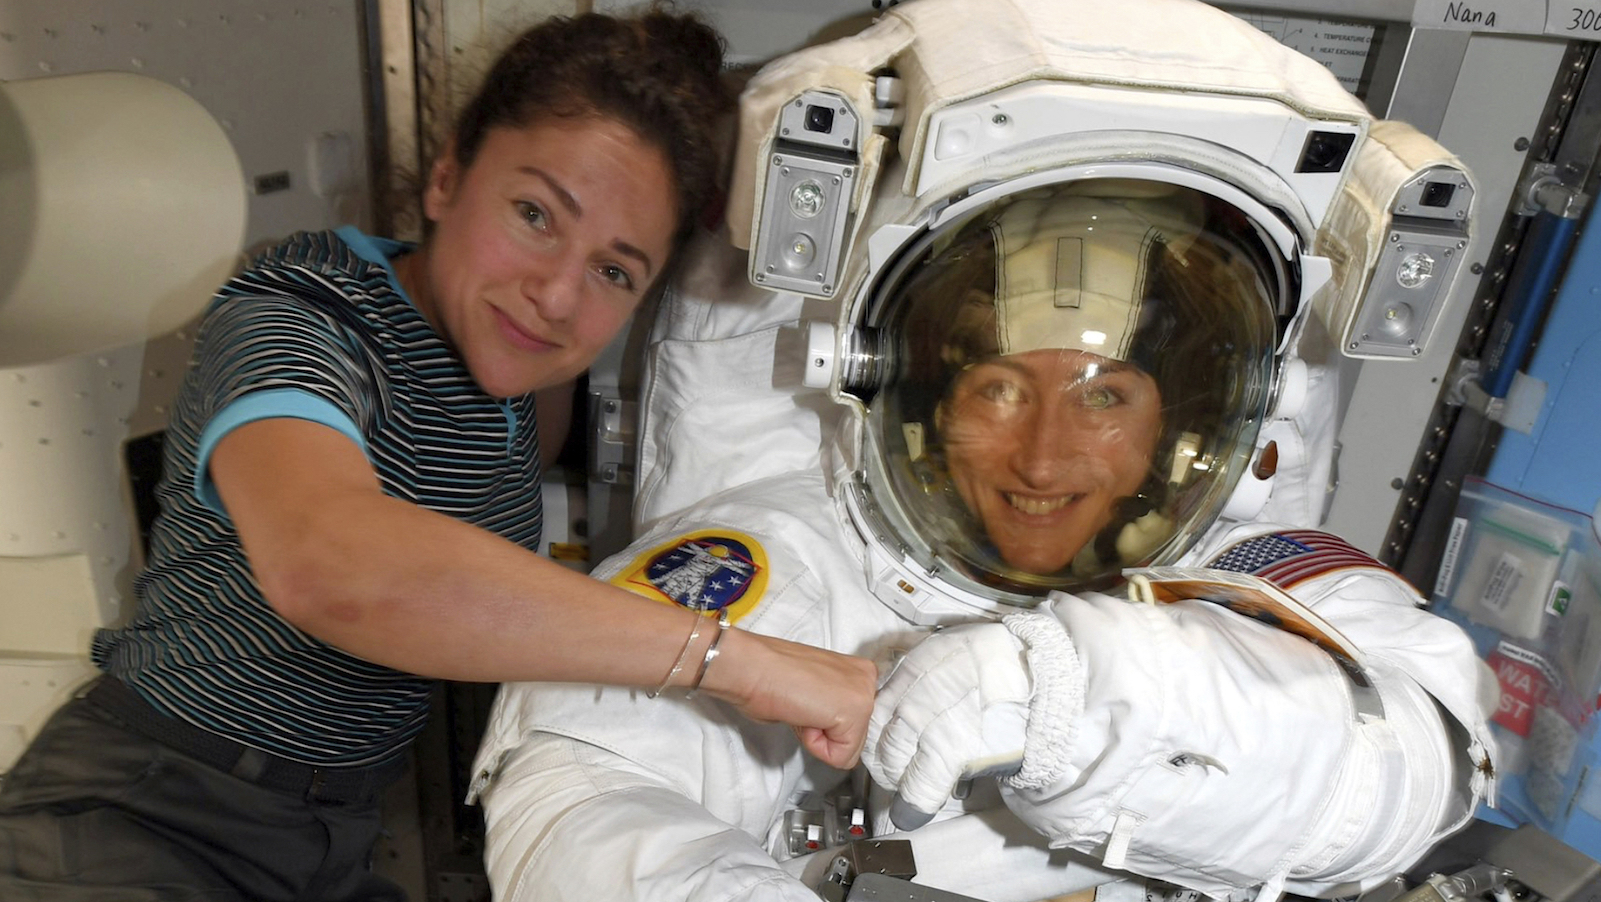 NASA's all-female spacewalk is a powerful metaphor